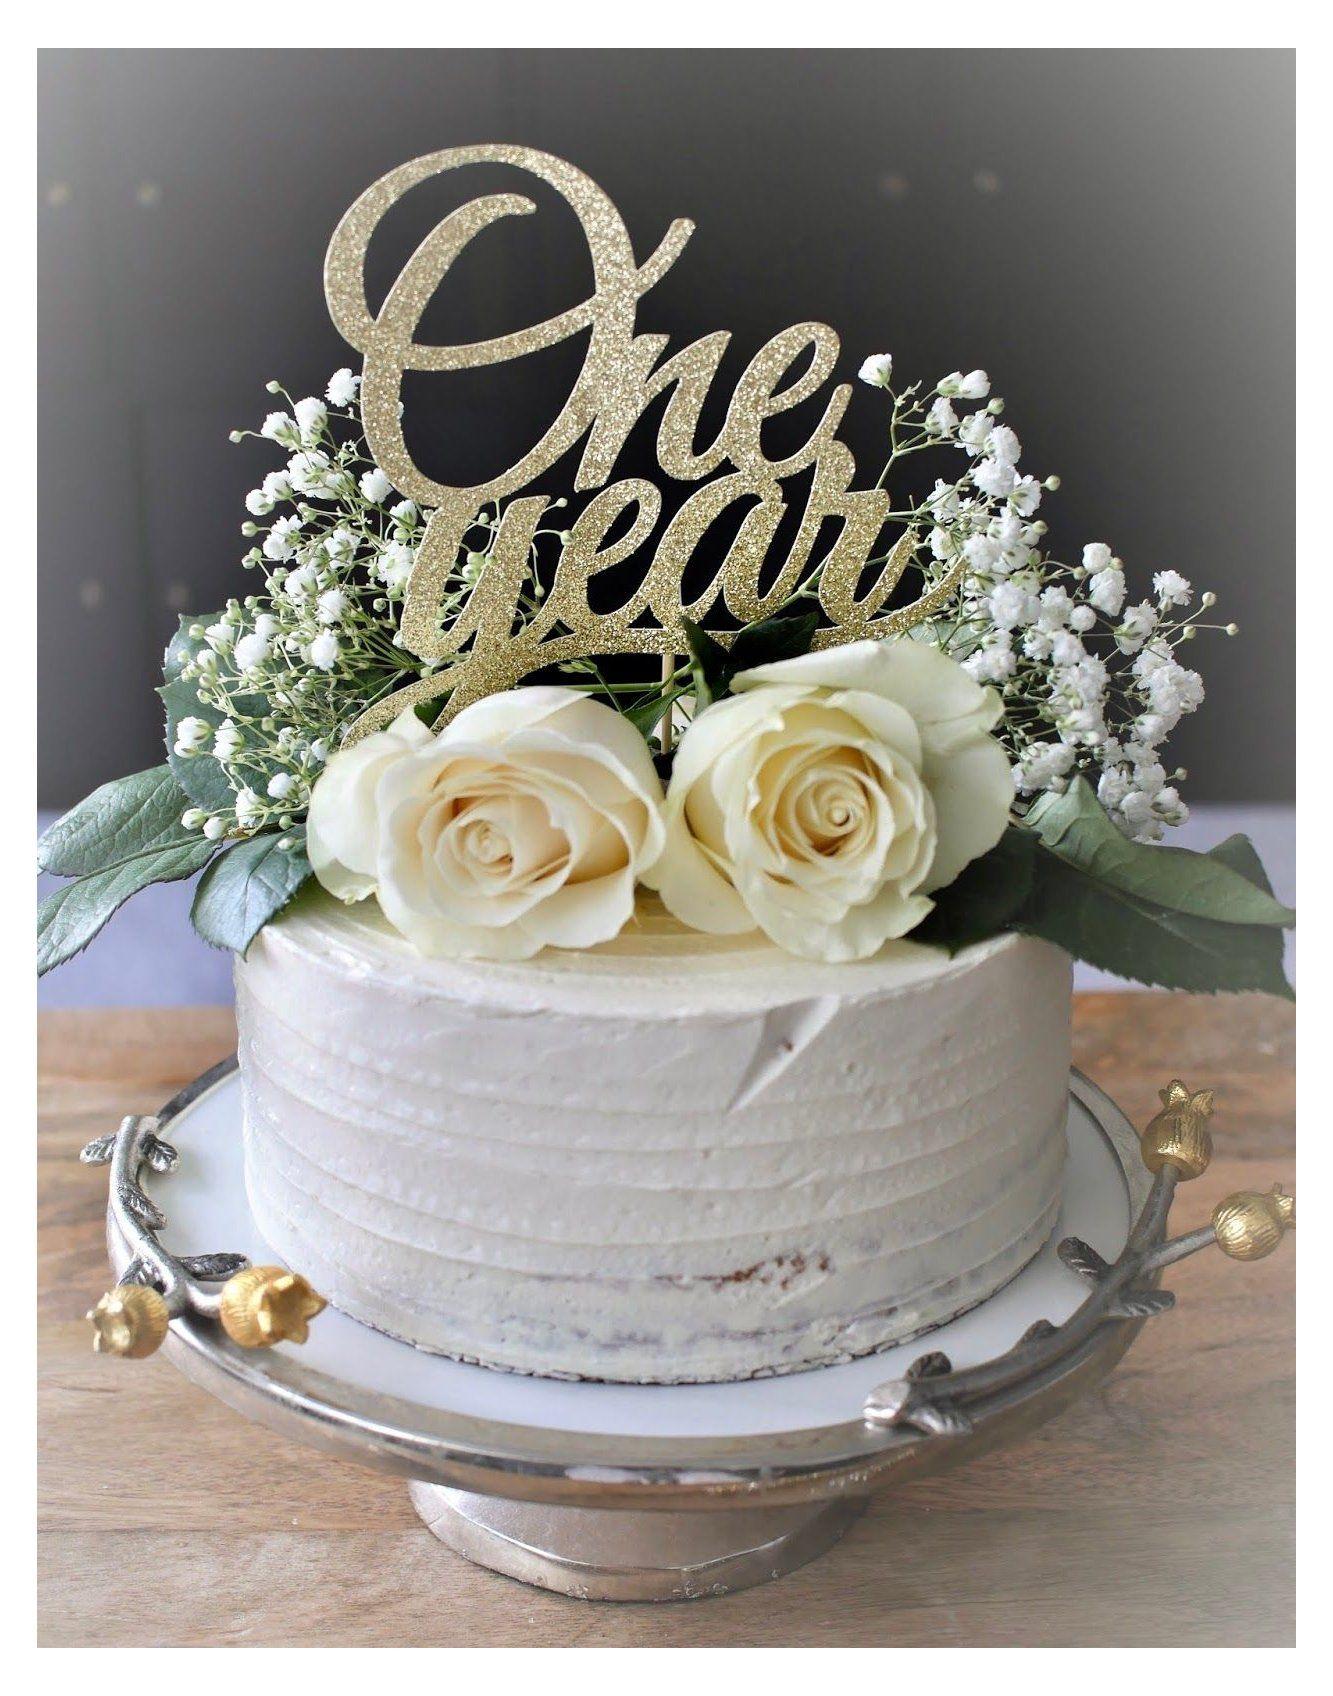 1 Year Wedding Anniversary Cake Tradition 1st Wedding Anniversary Cake The Urban Mon Happy Anniversary Cakes Wedding Anniversary Cakes 1st Anniversary Cake